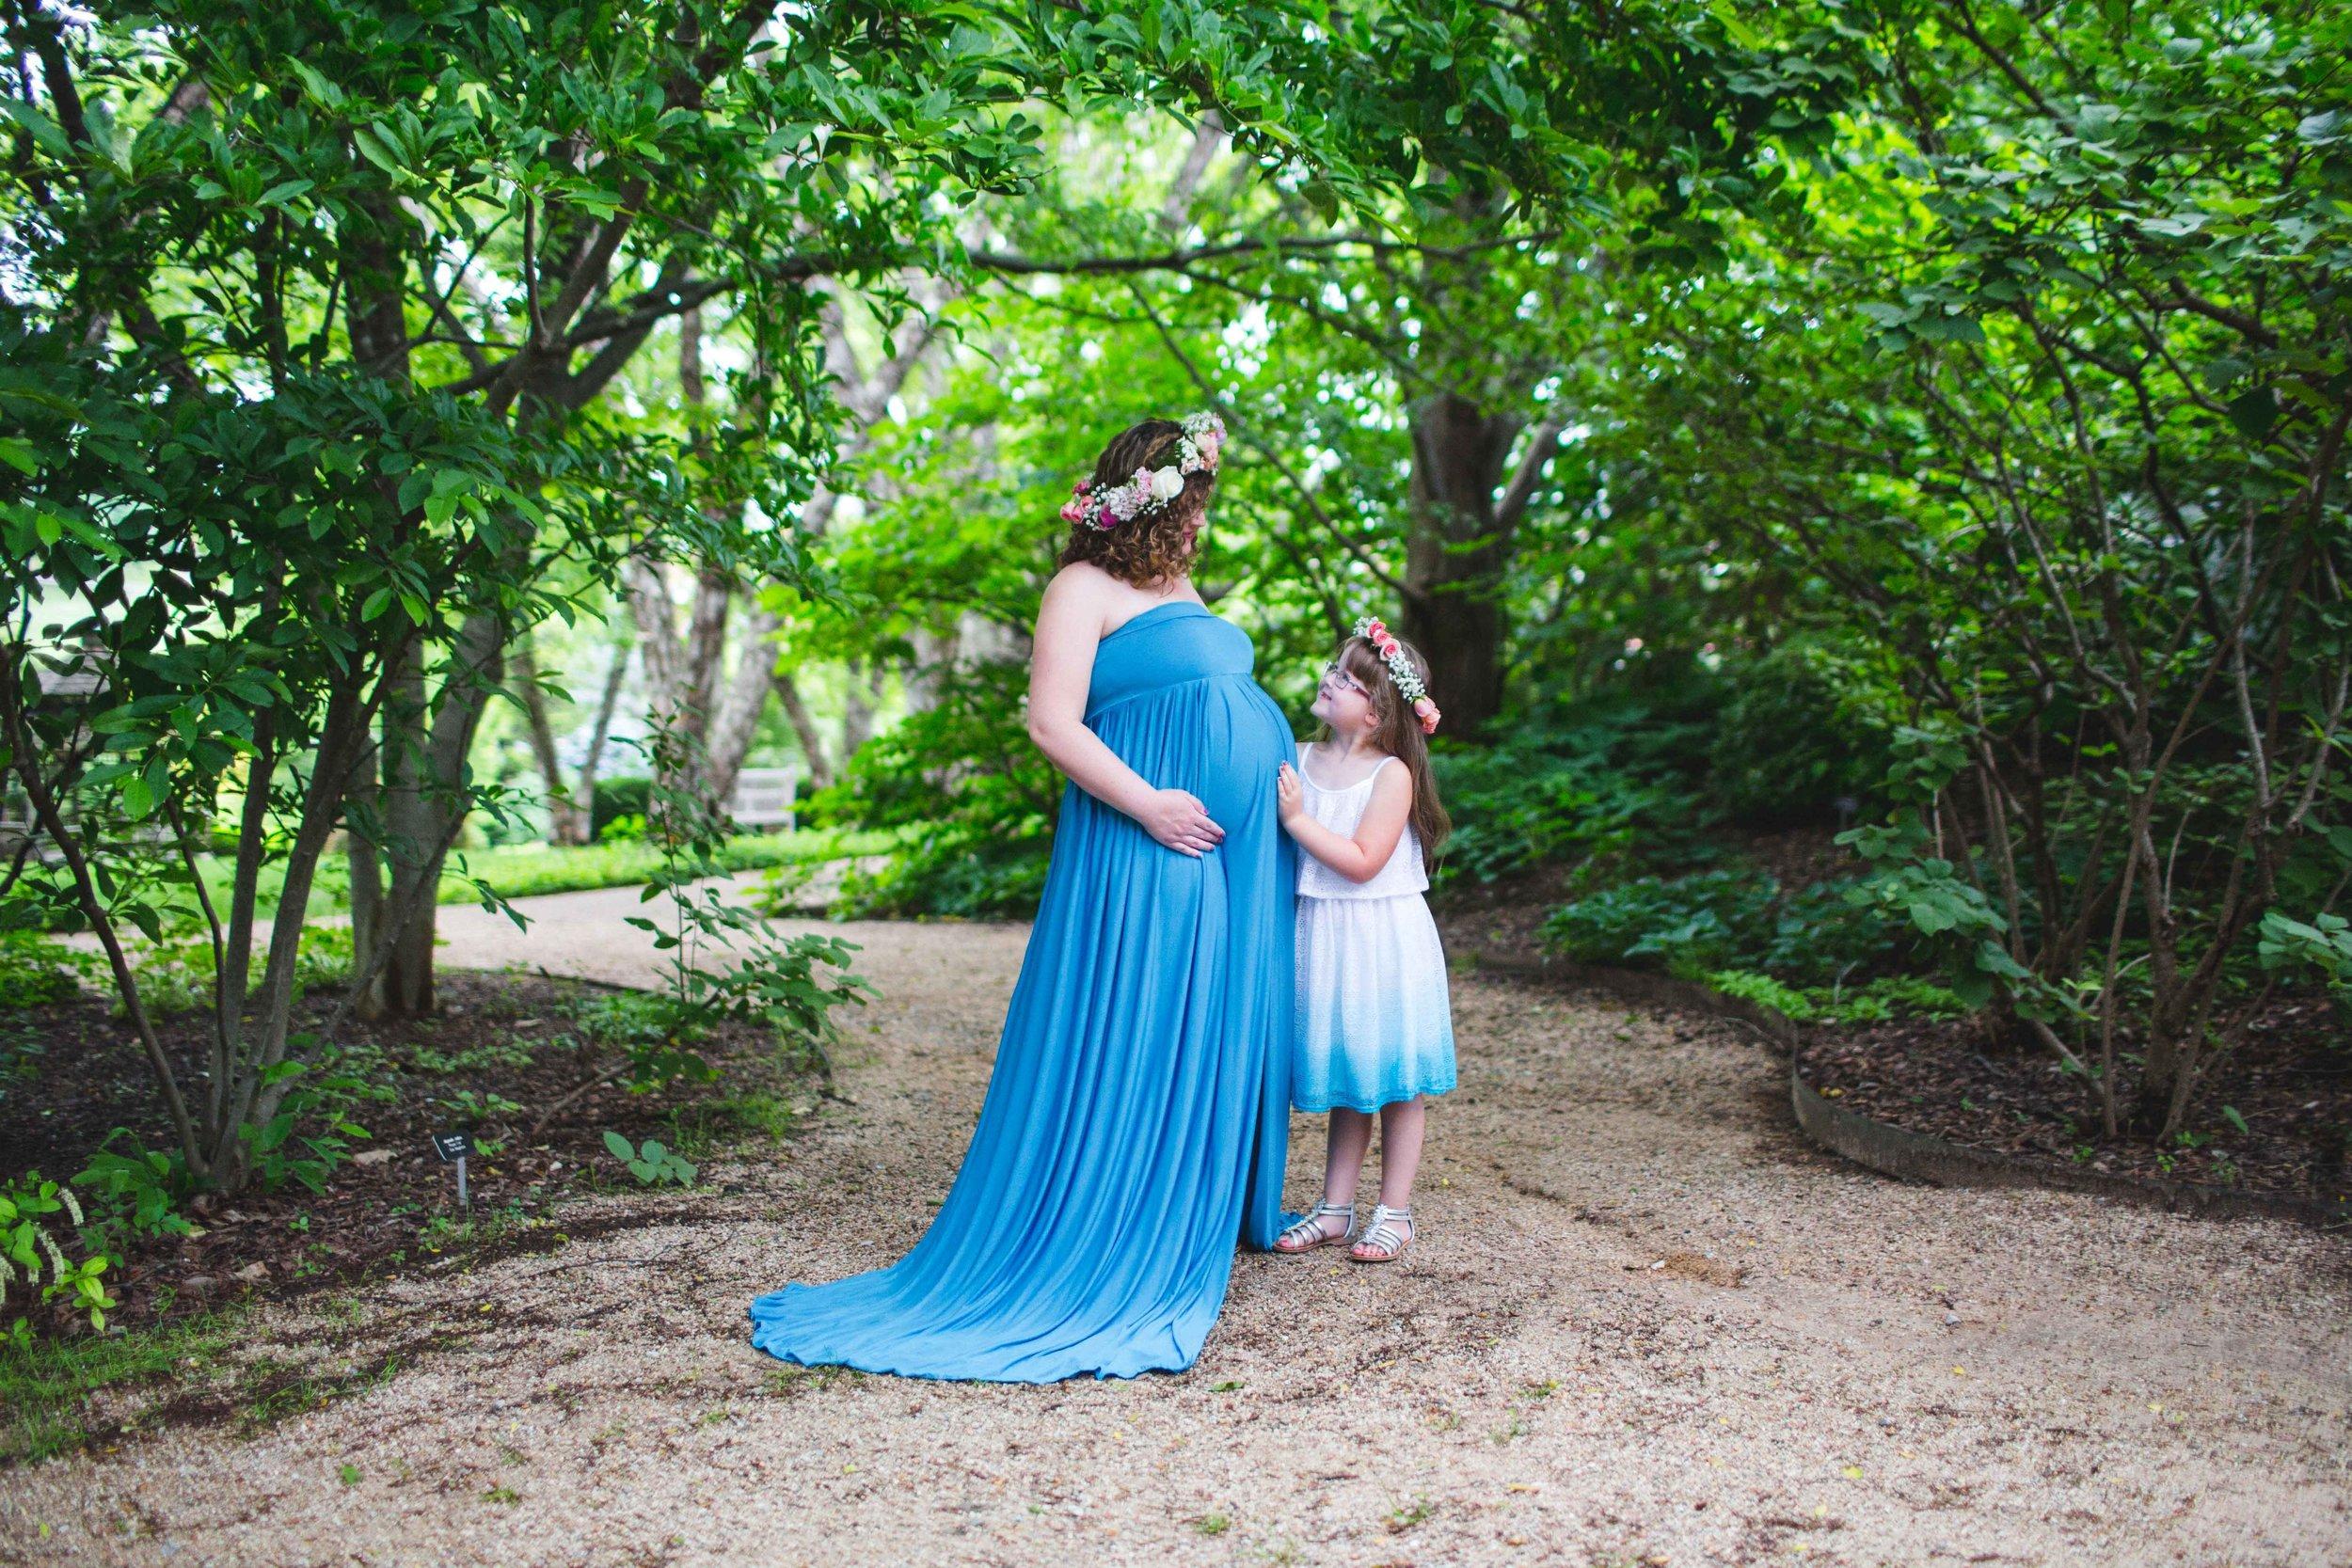 roanoke-maternity-photographer-21.jpg